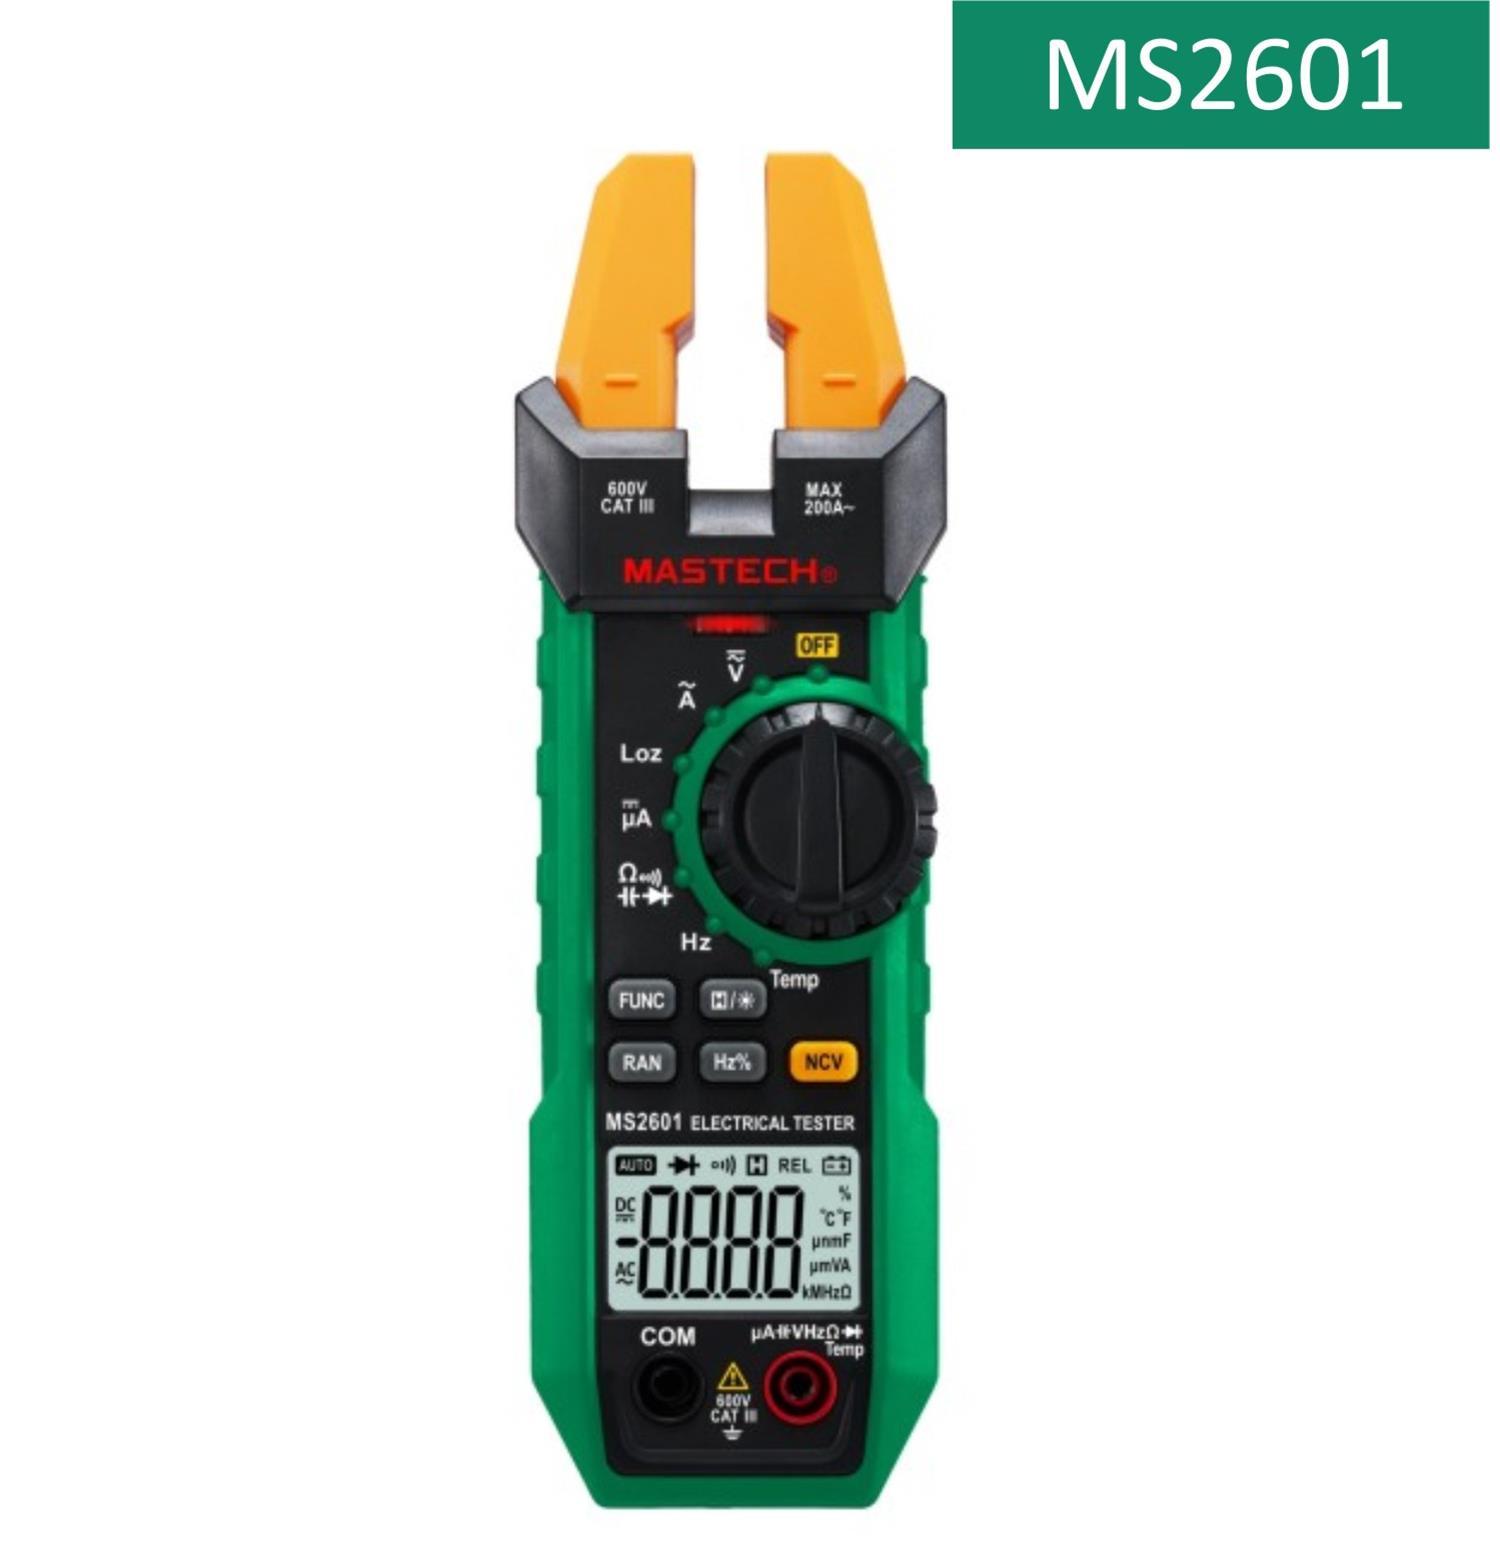 MS2601